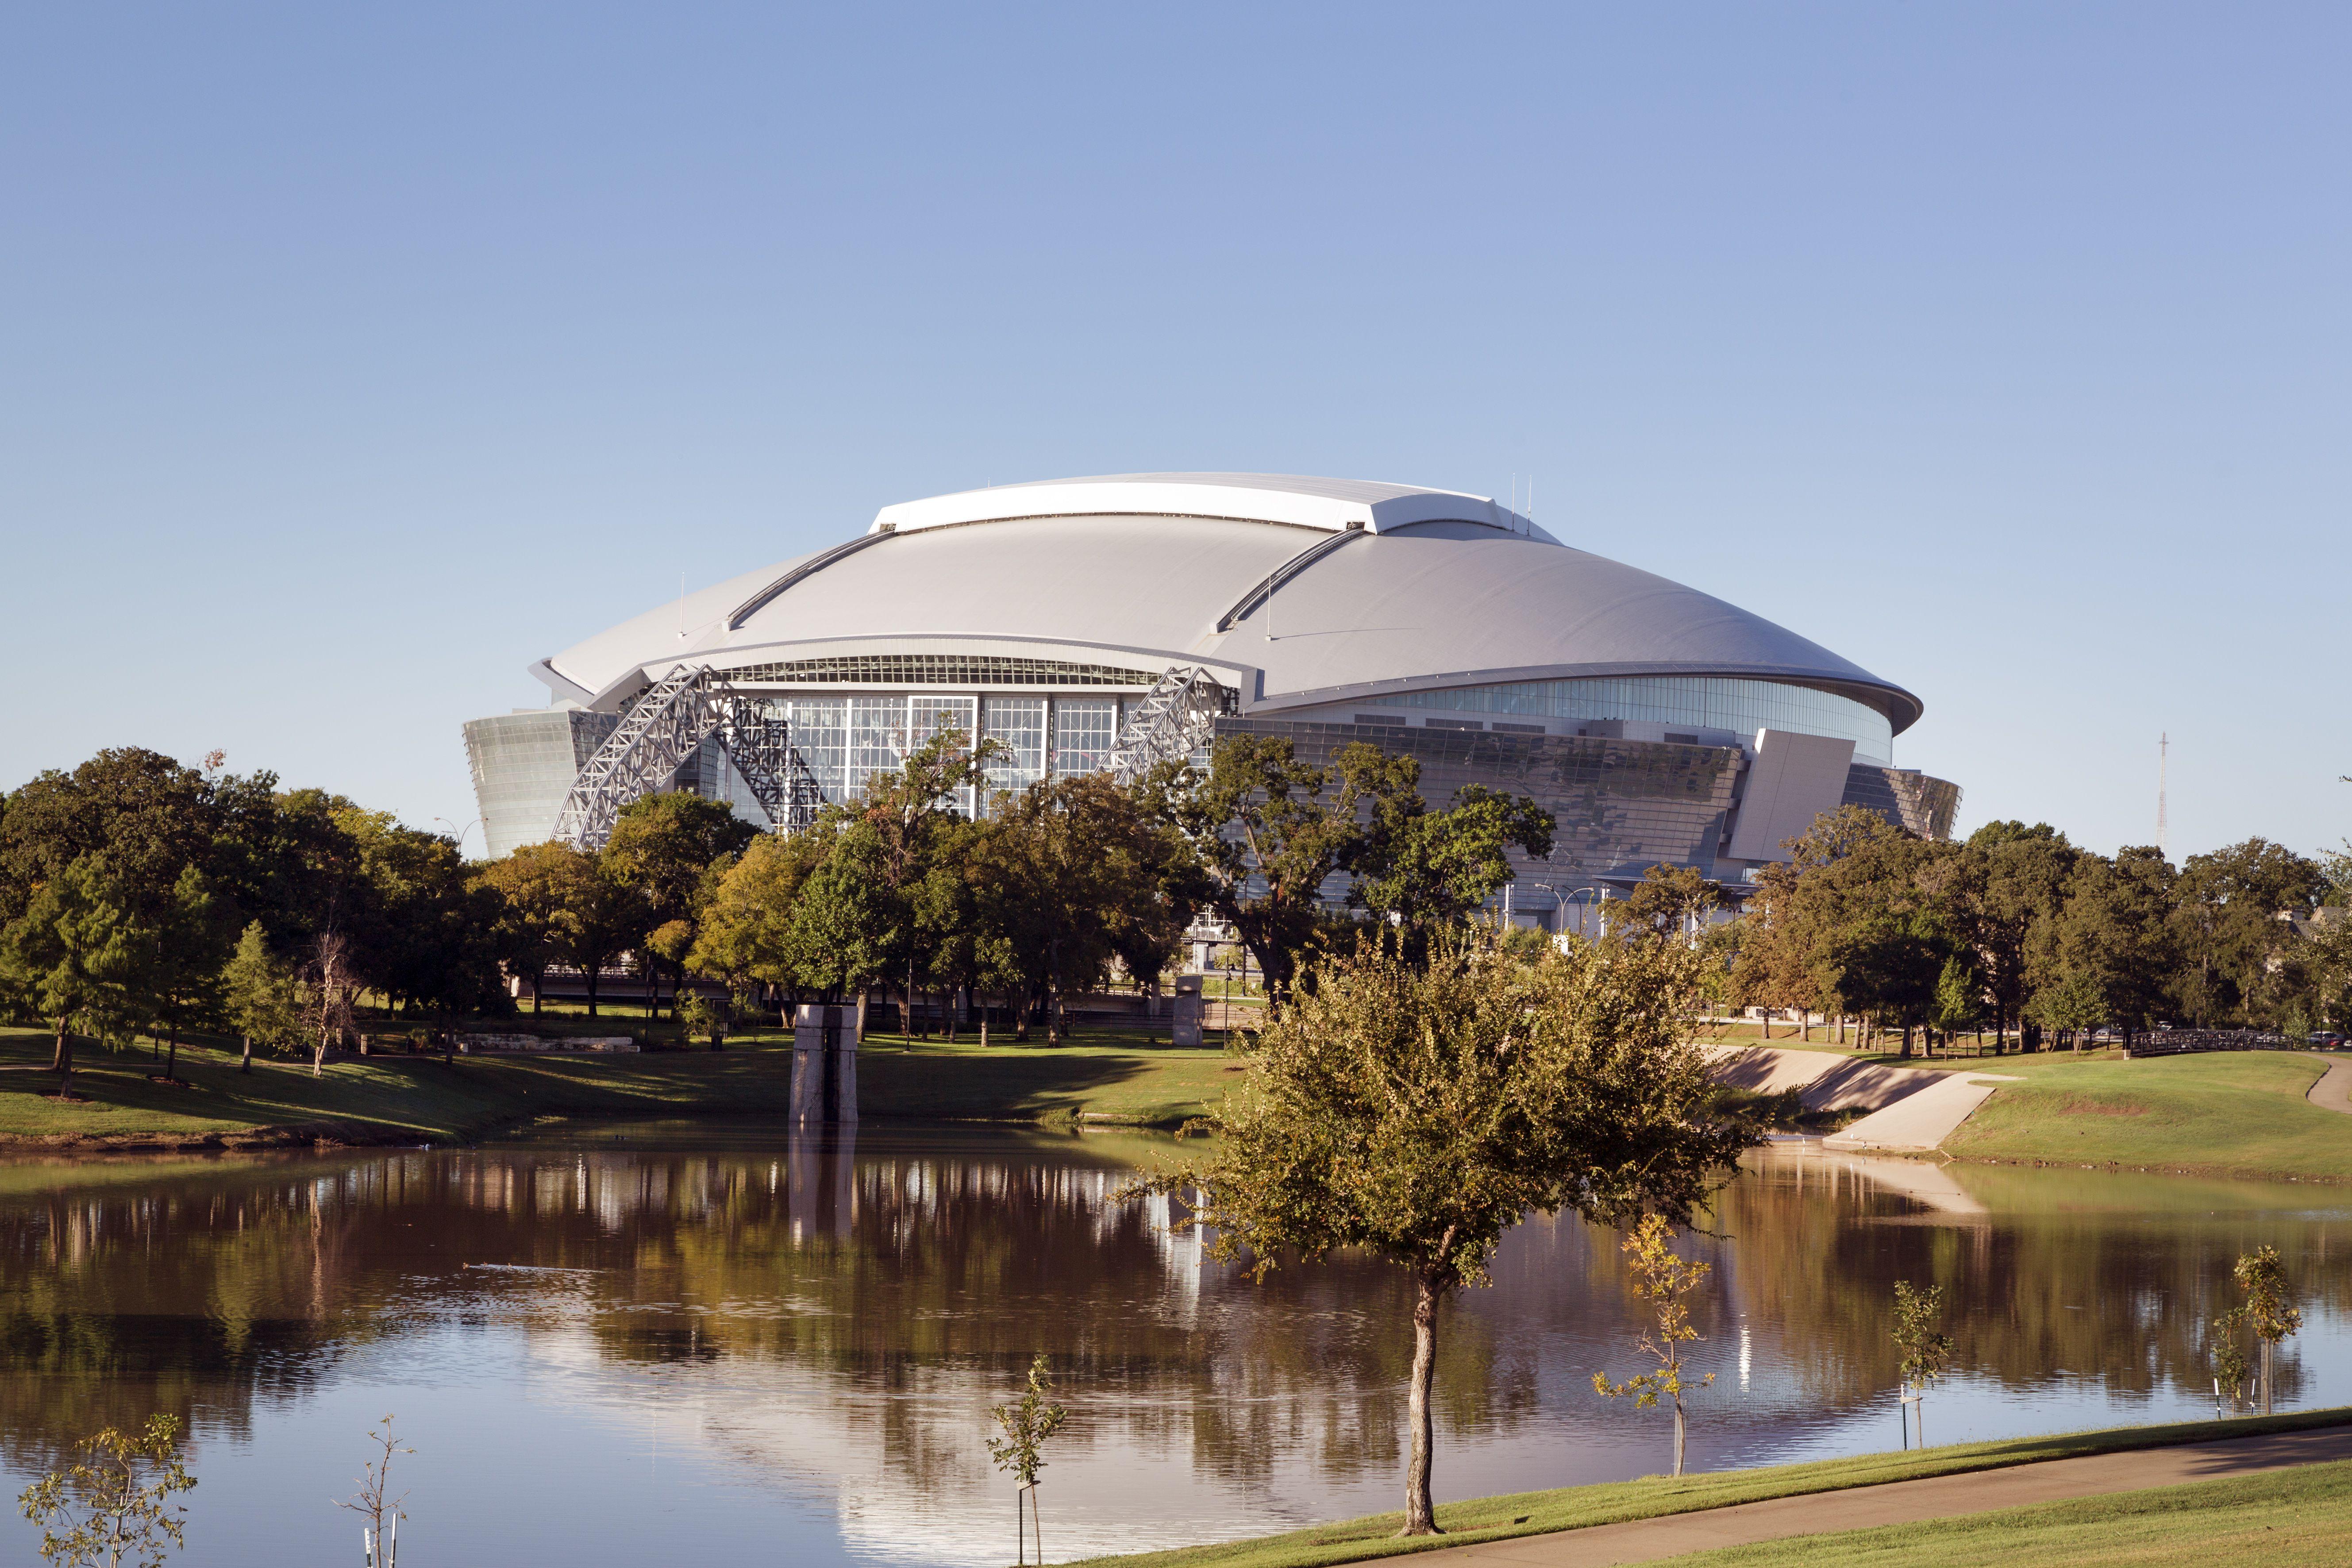 Retractable dome and glass walls of Cowboys Stadium in Arlington, Texas